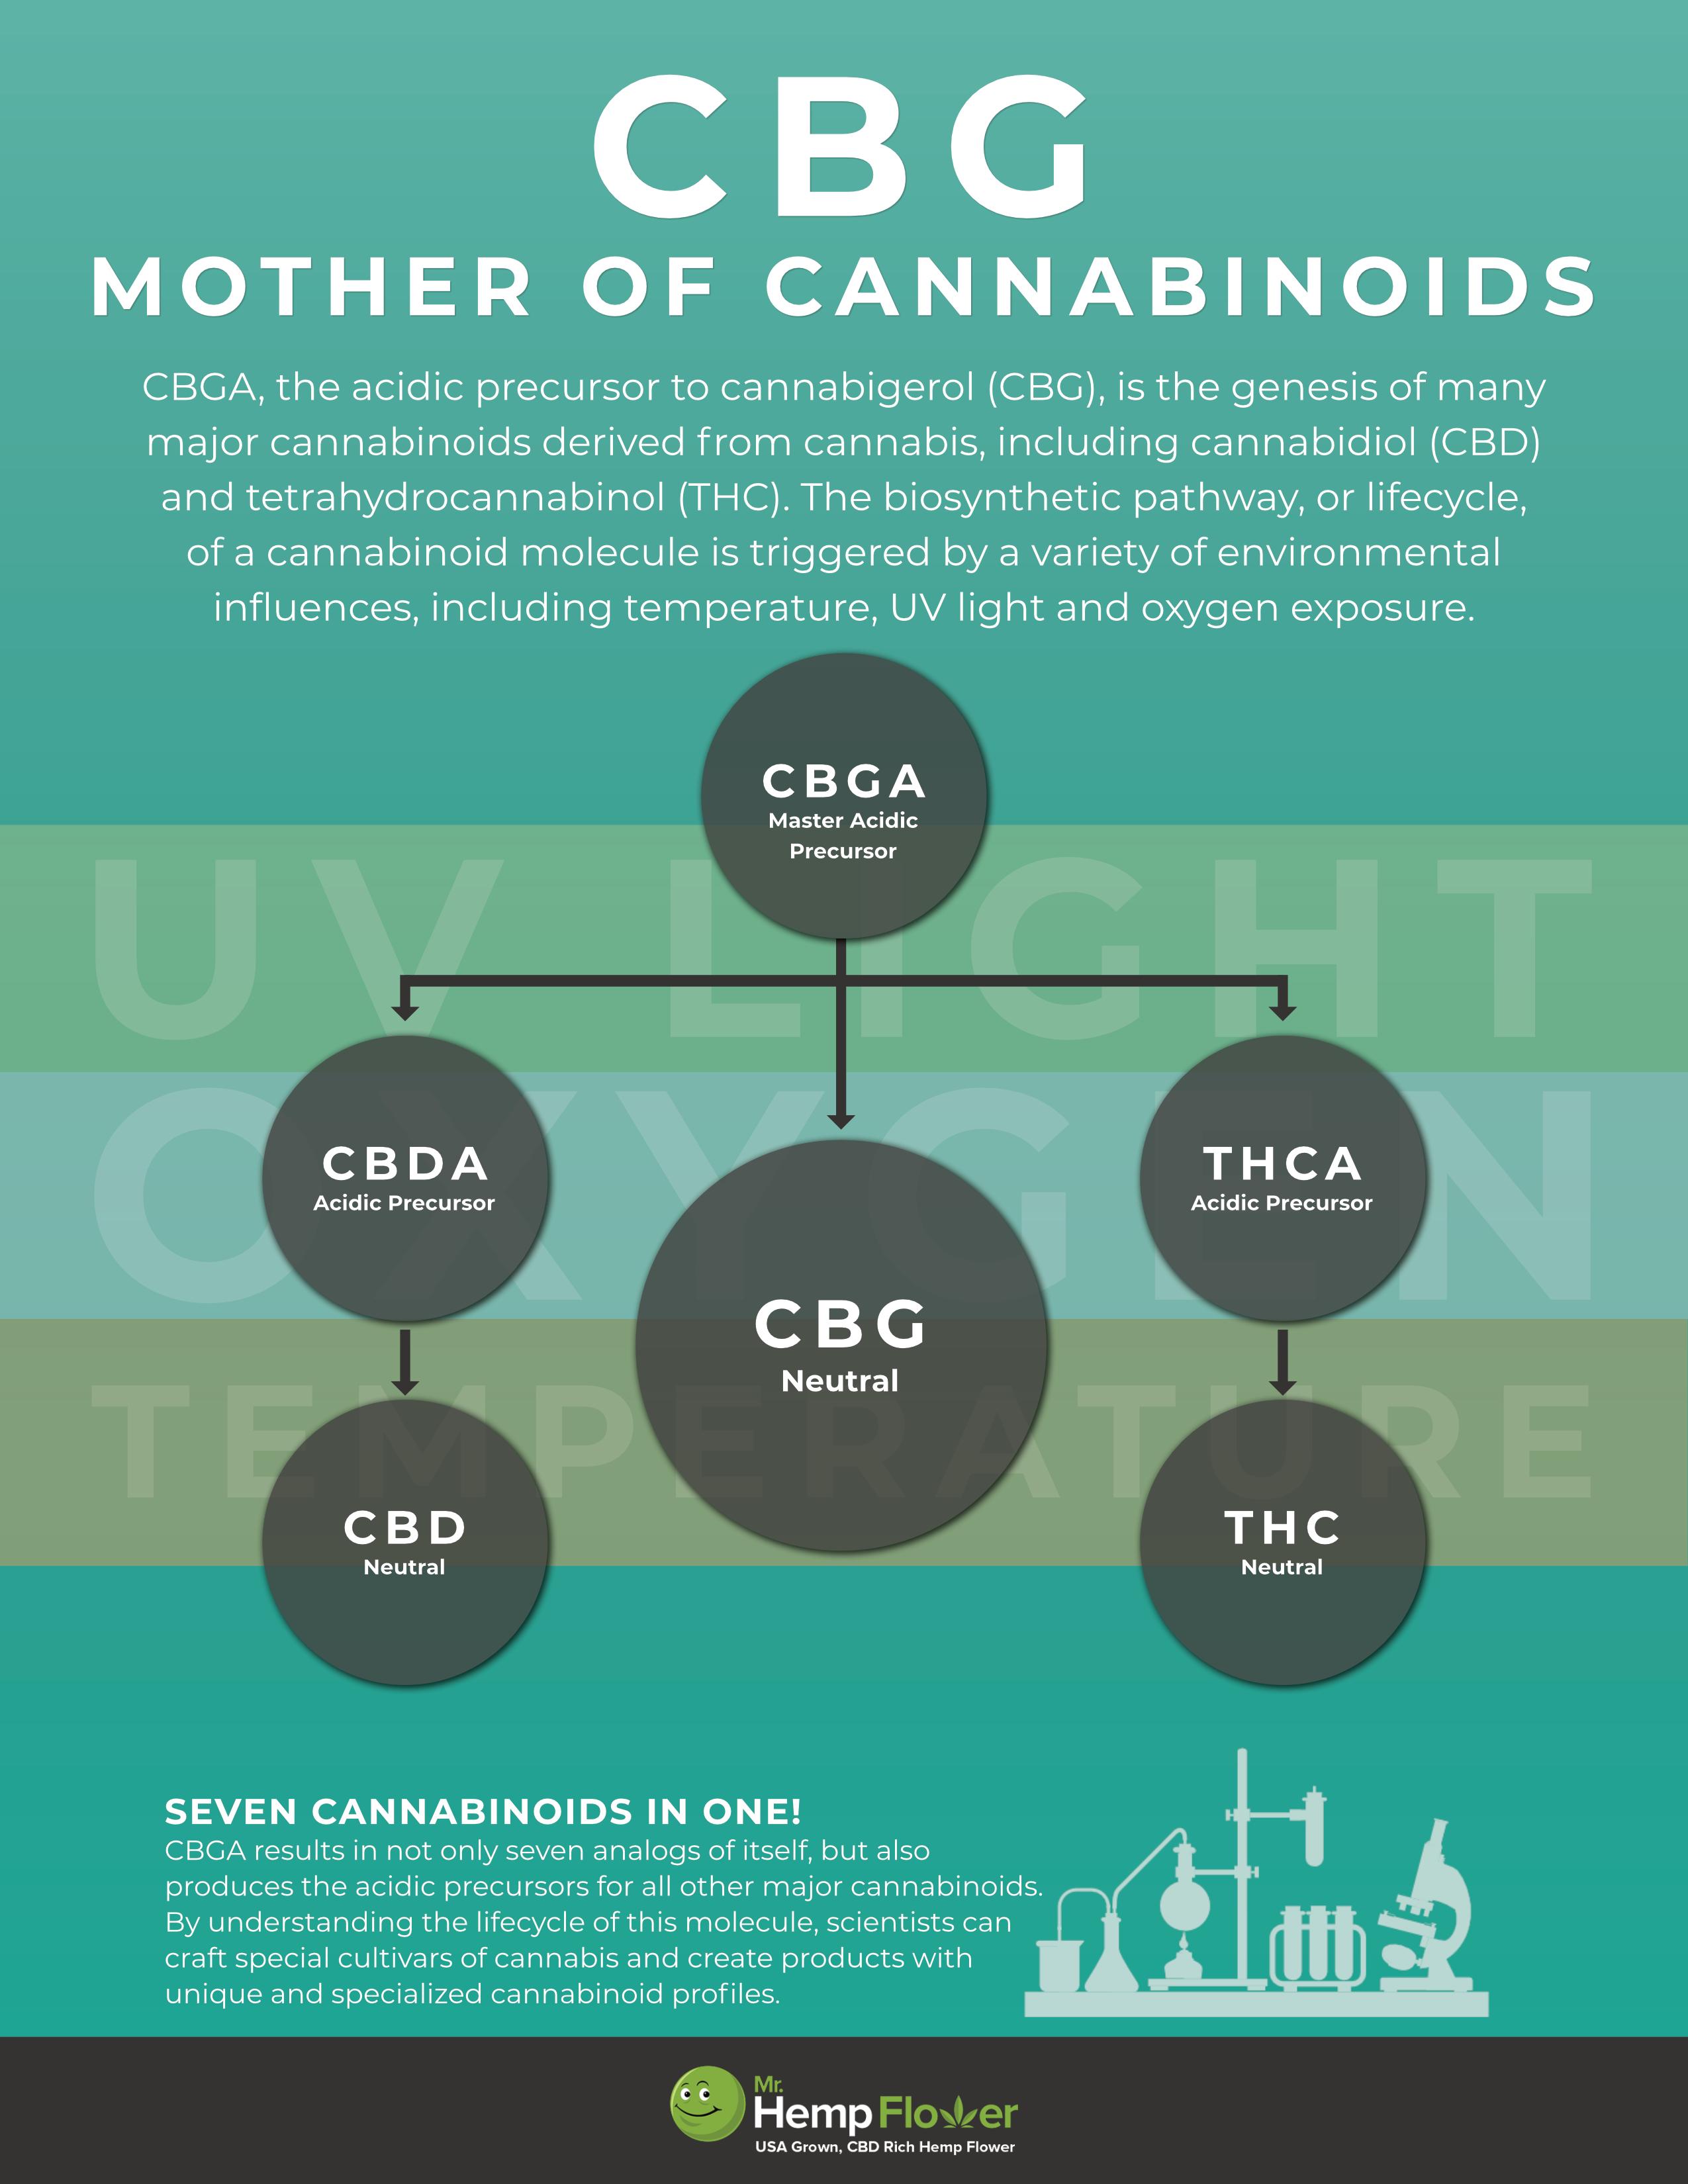 CBG Mother of Cannabinoids